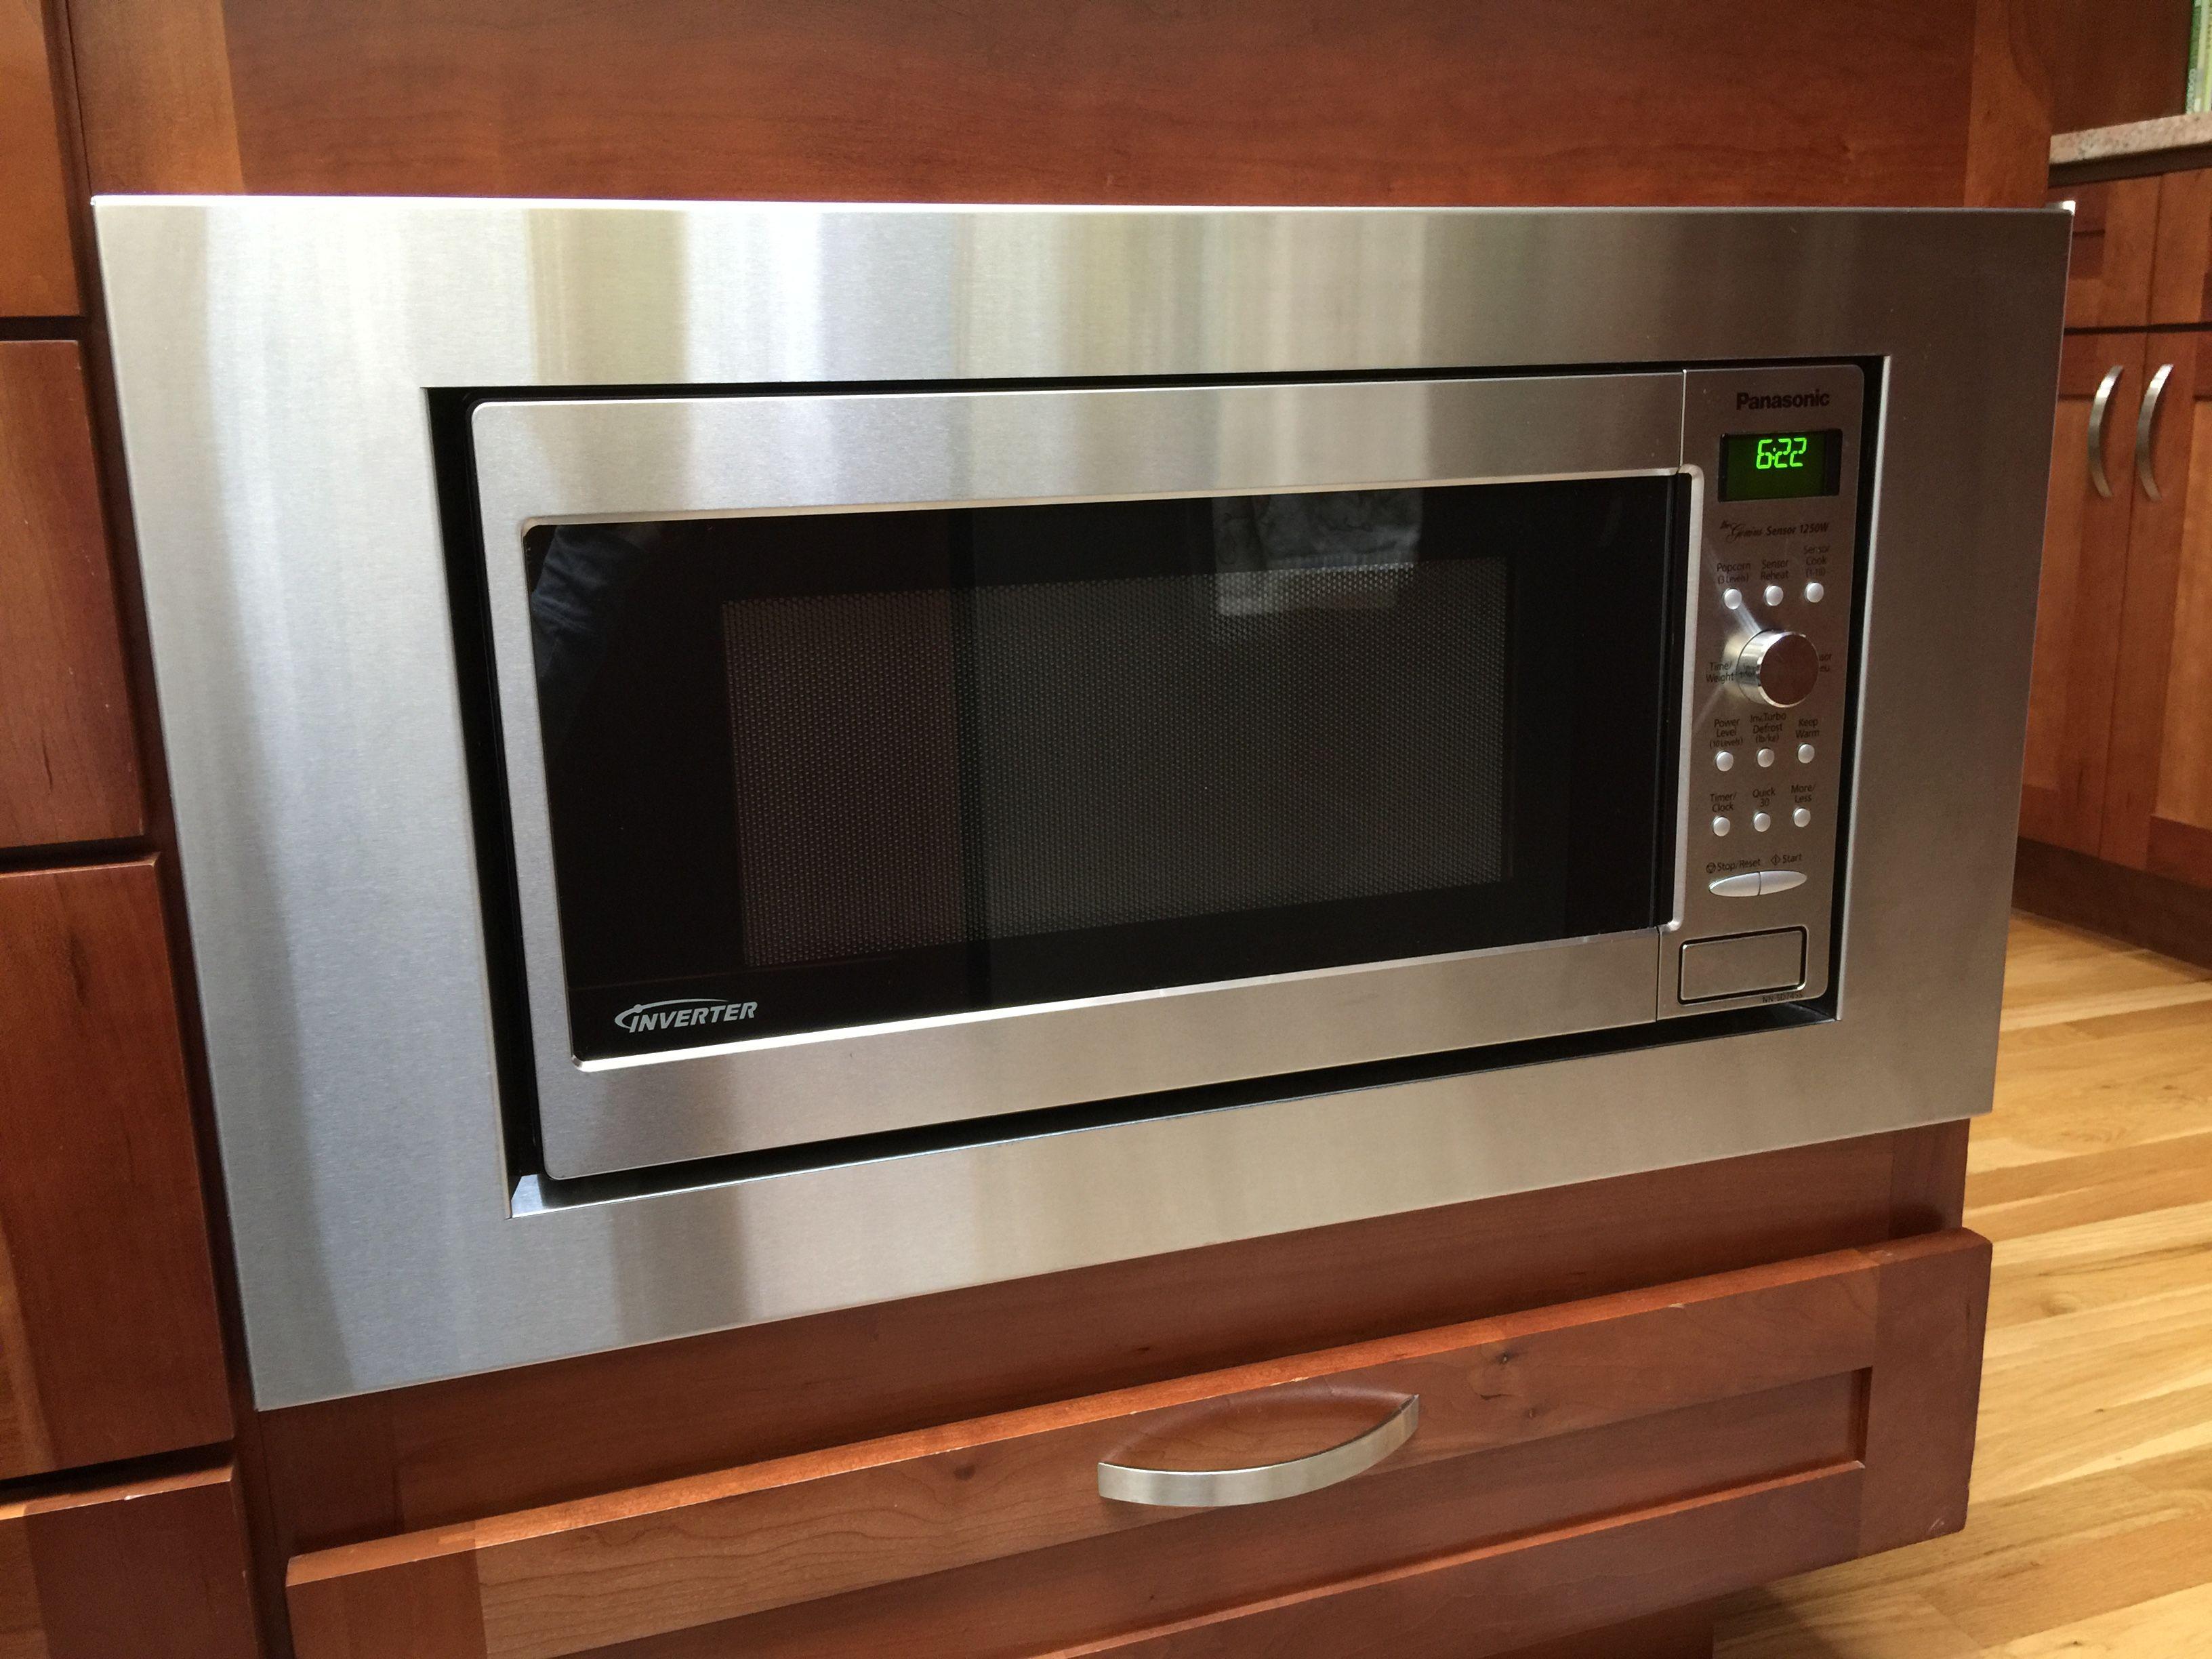 Custom Trim Kit For A Panasonic Microwave Model Nn Sd745s